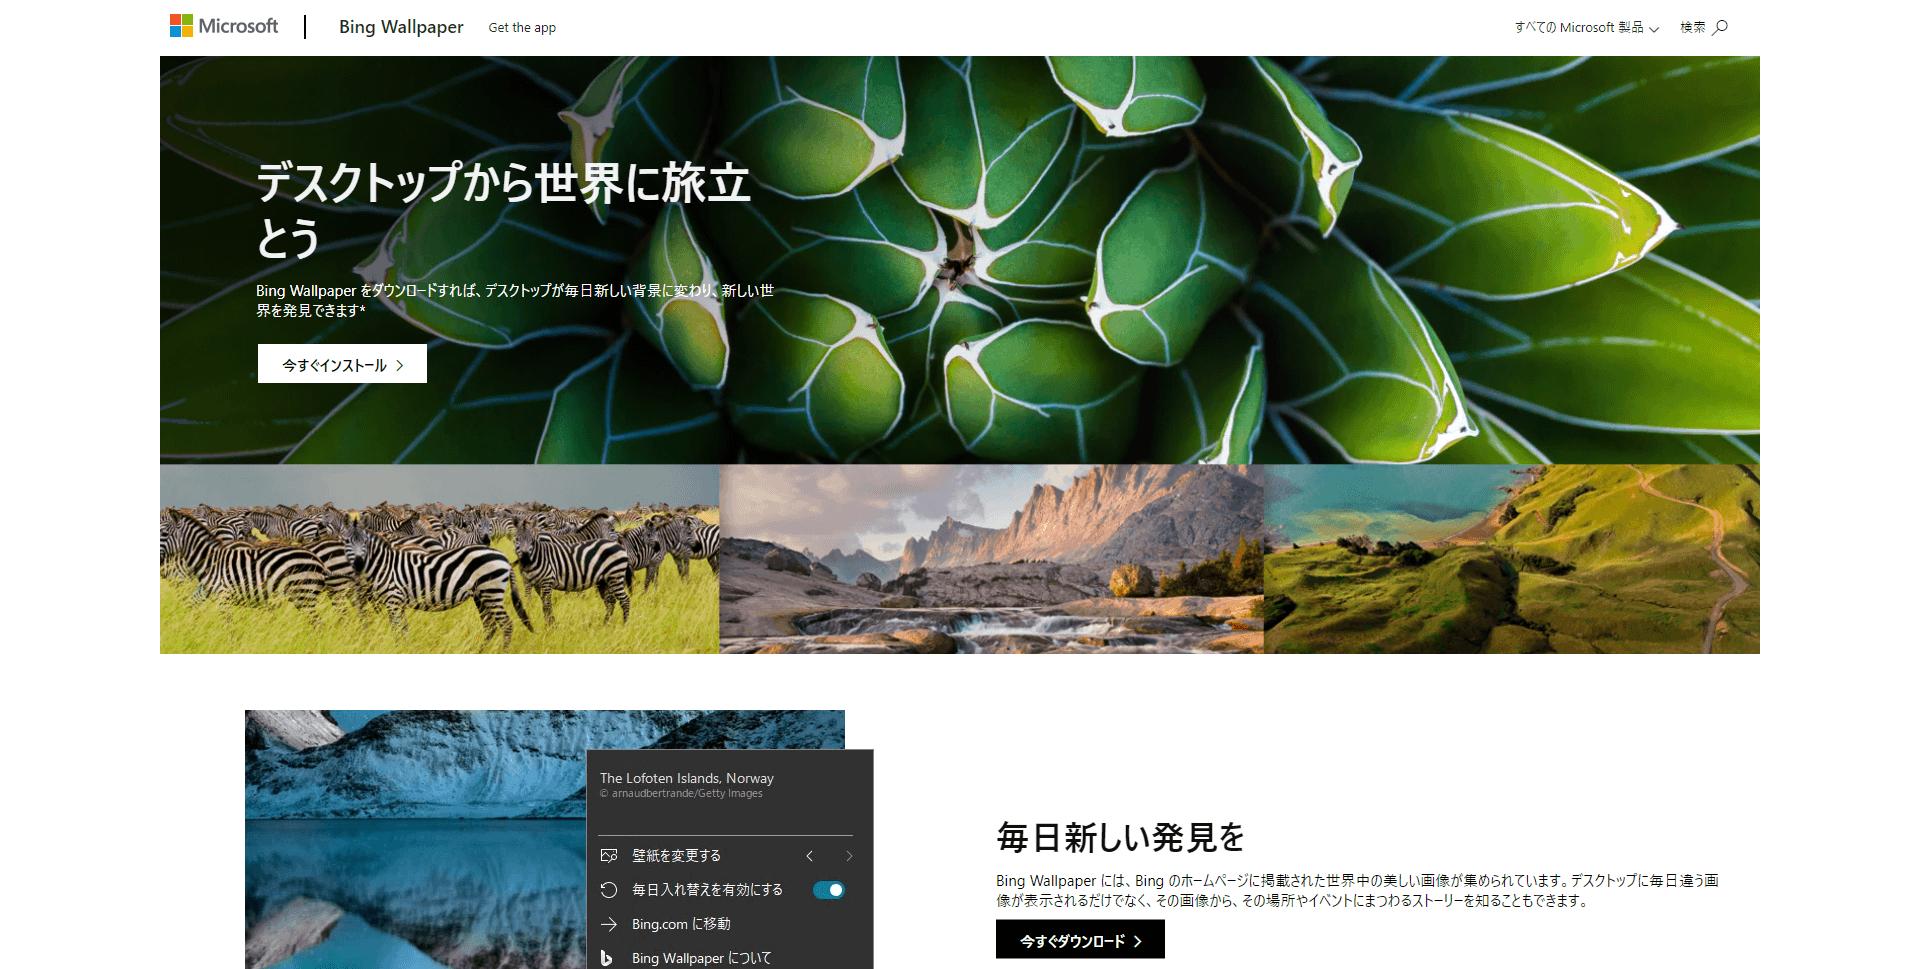 Bing Wallpaper 公式サイト